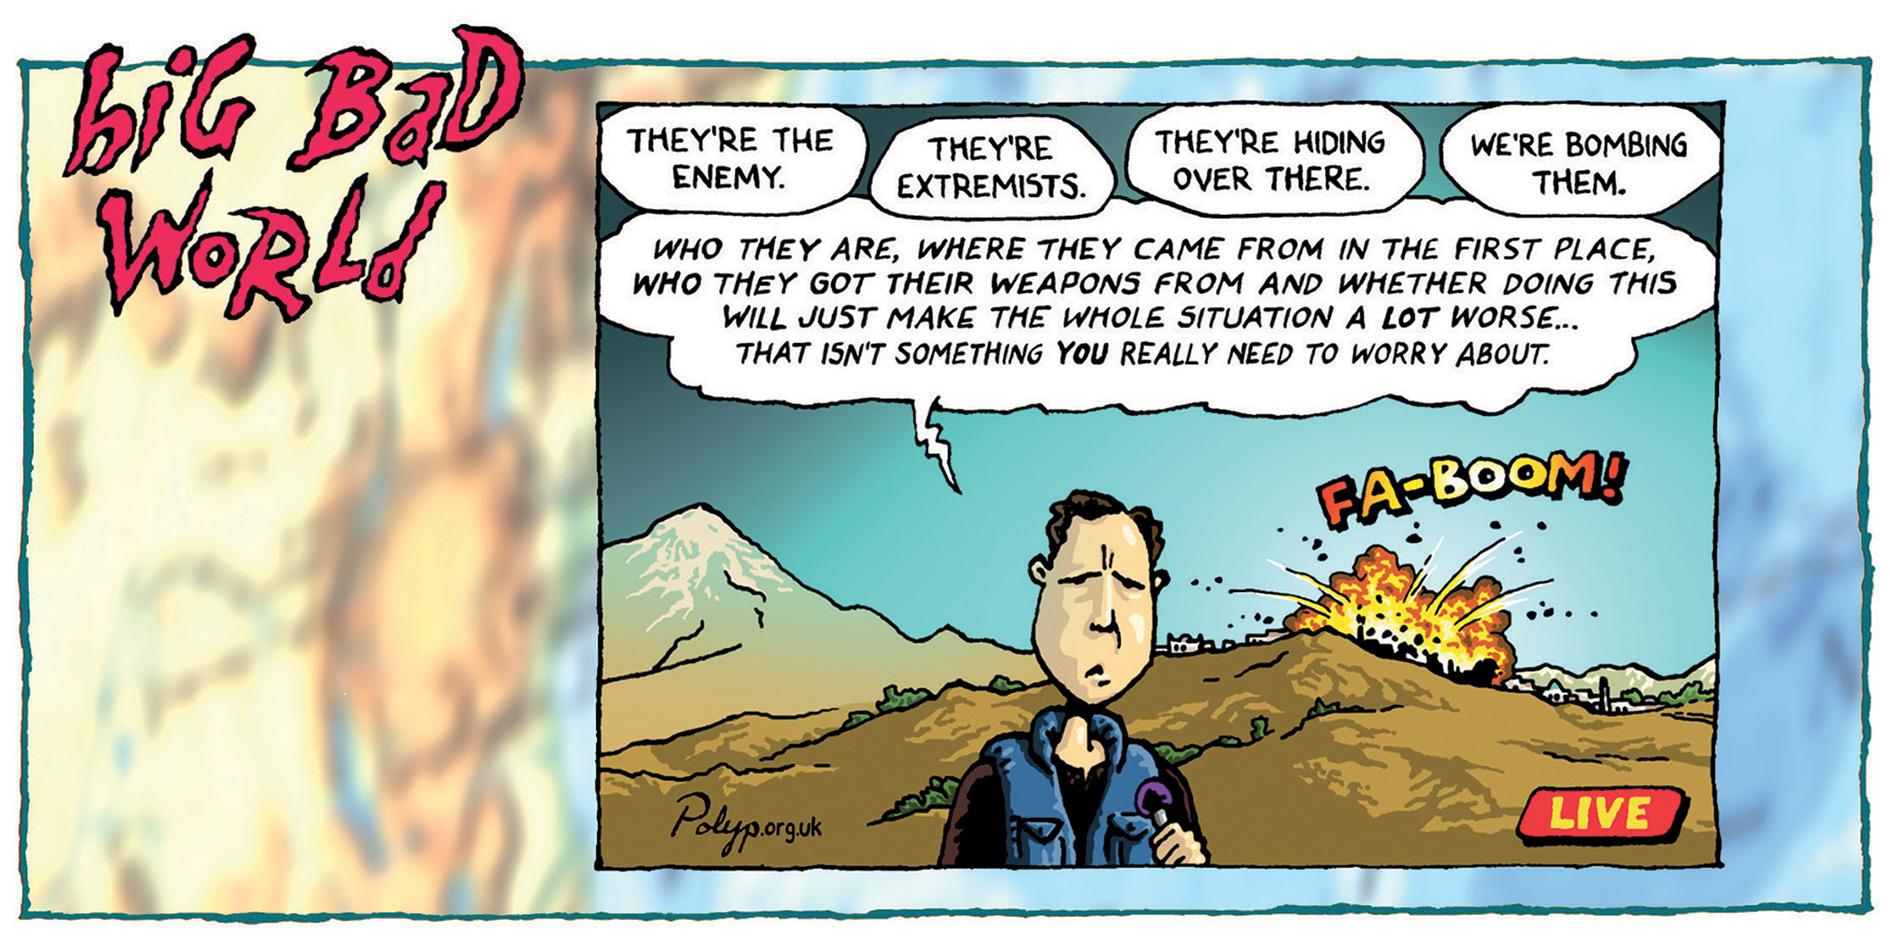 Big Bad World - The Enemy